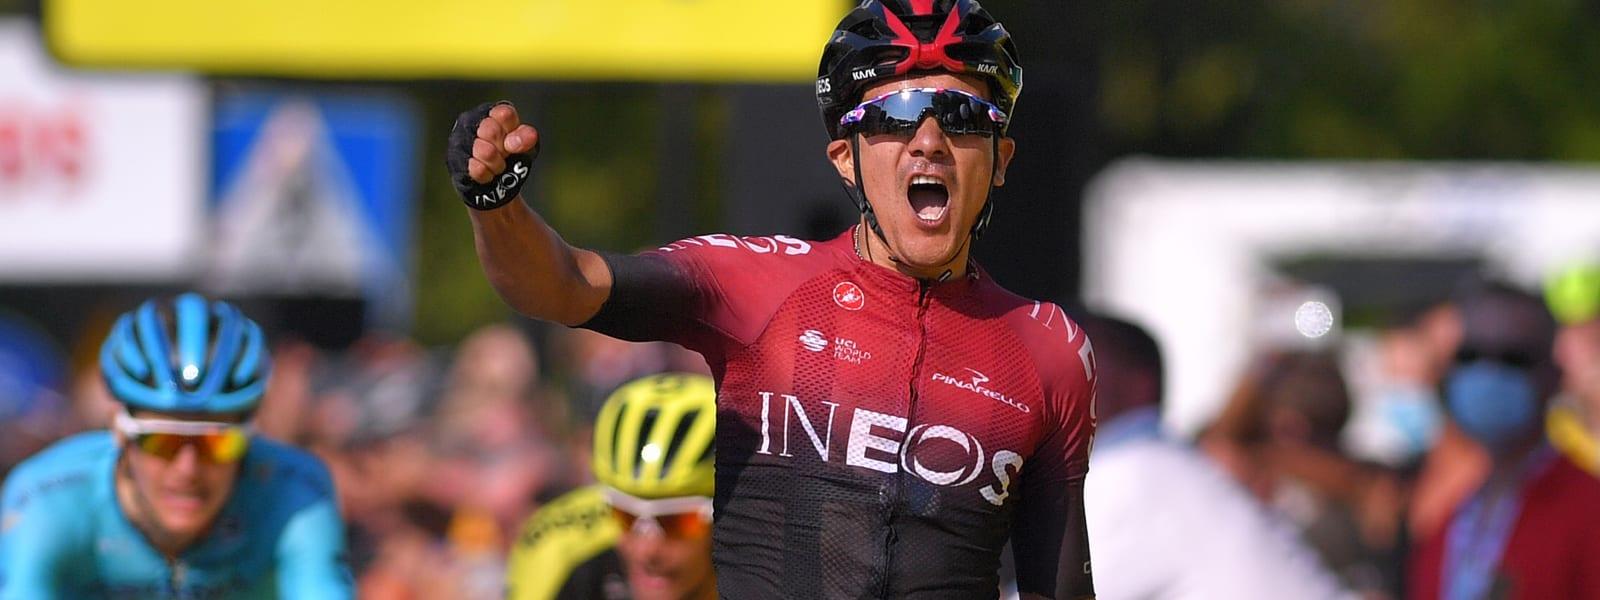 Richard Carapaz etapa 3 Tour Polonia 2020 - ph. Team Ineos - www.ciclismocolombiano.com